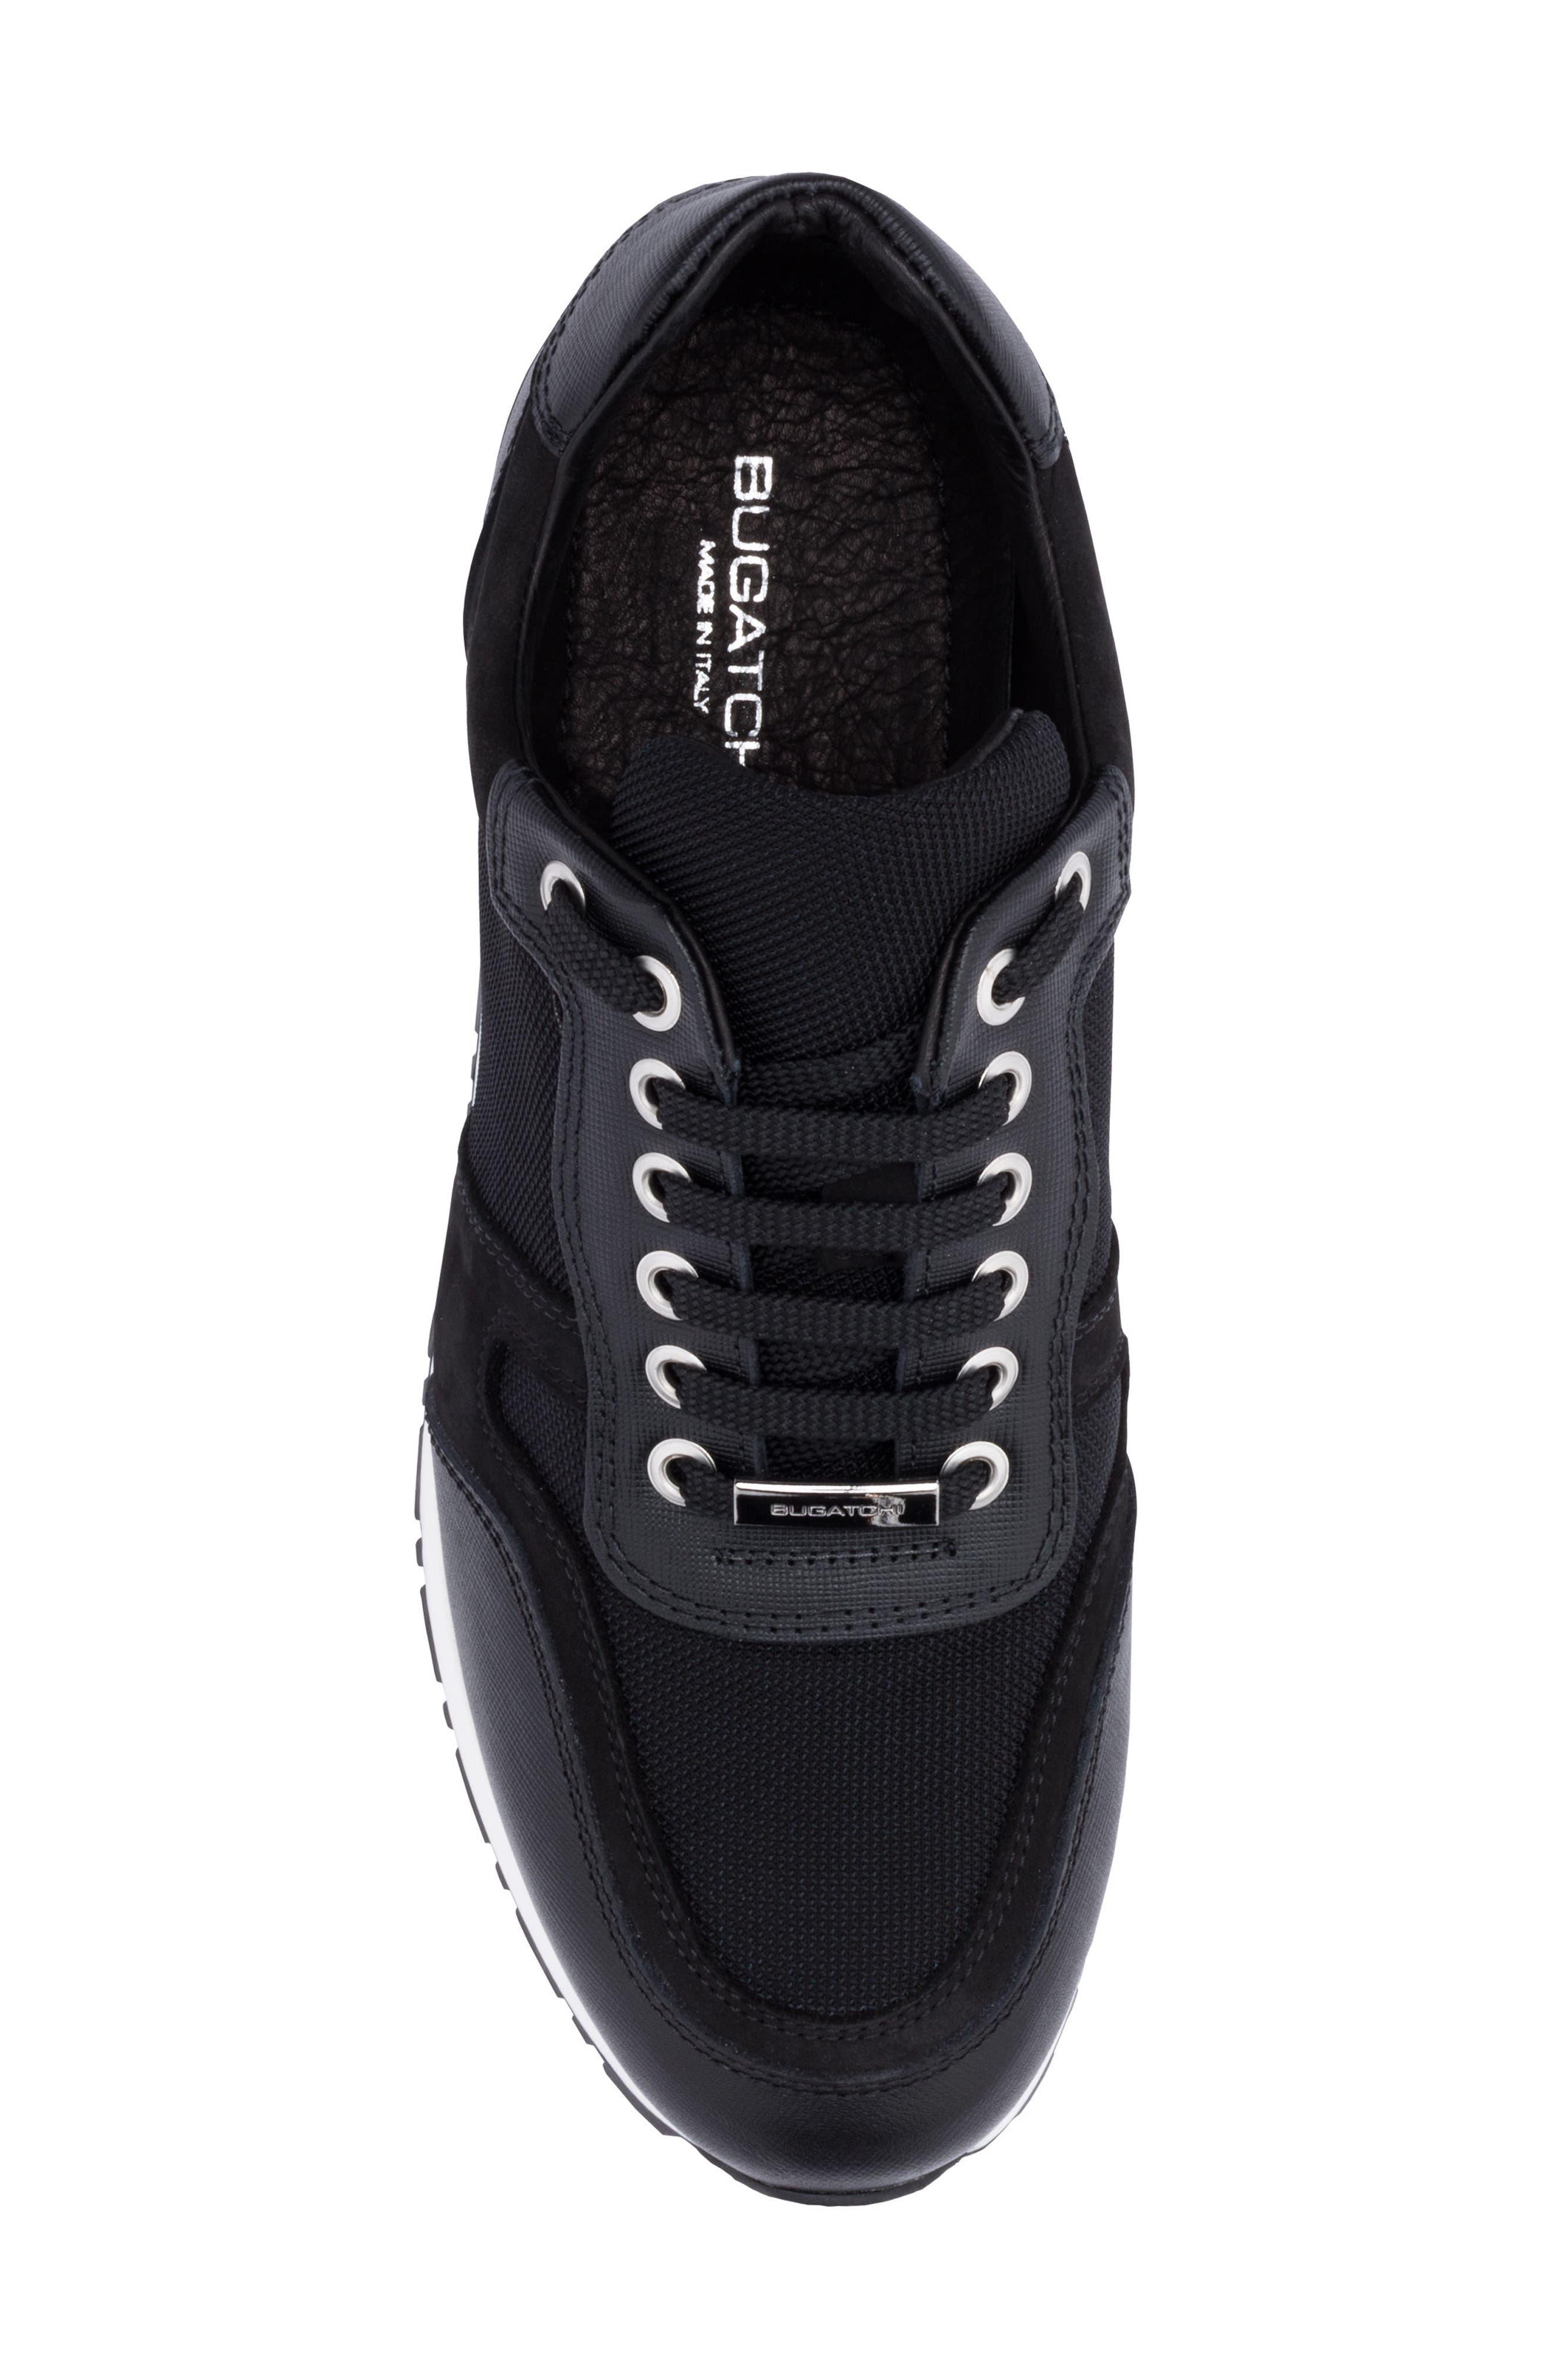 Modena Sneaker,                             Alternate thumbnail 5, color,                             001